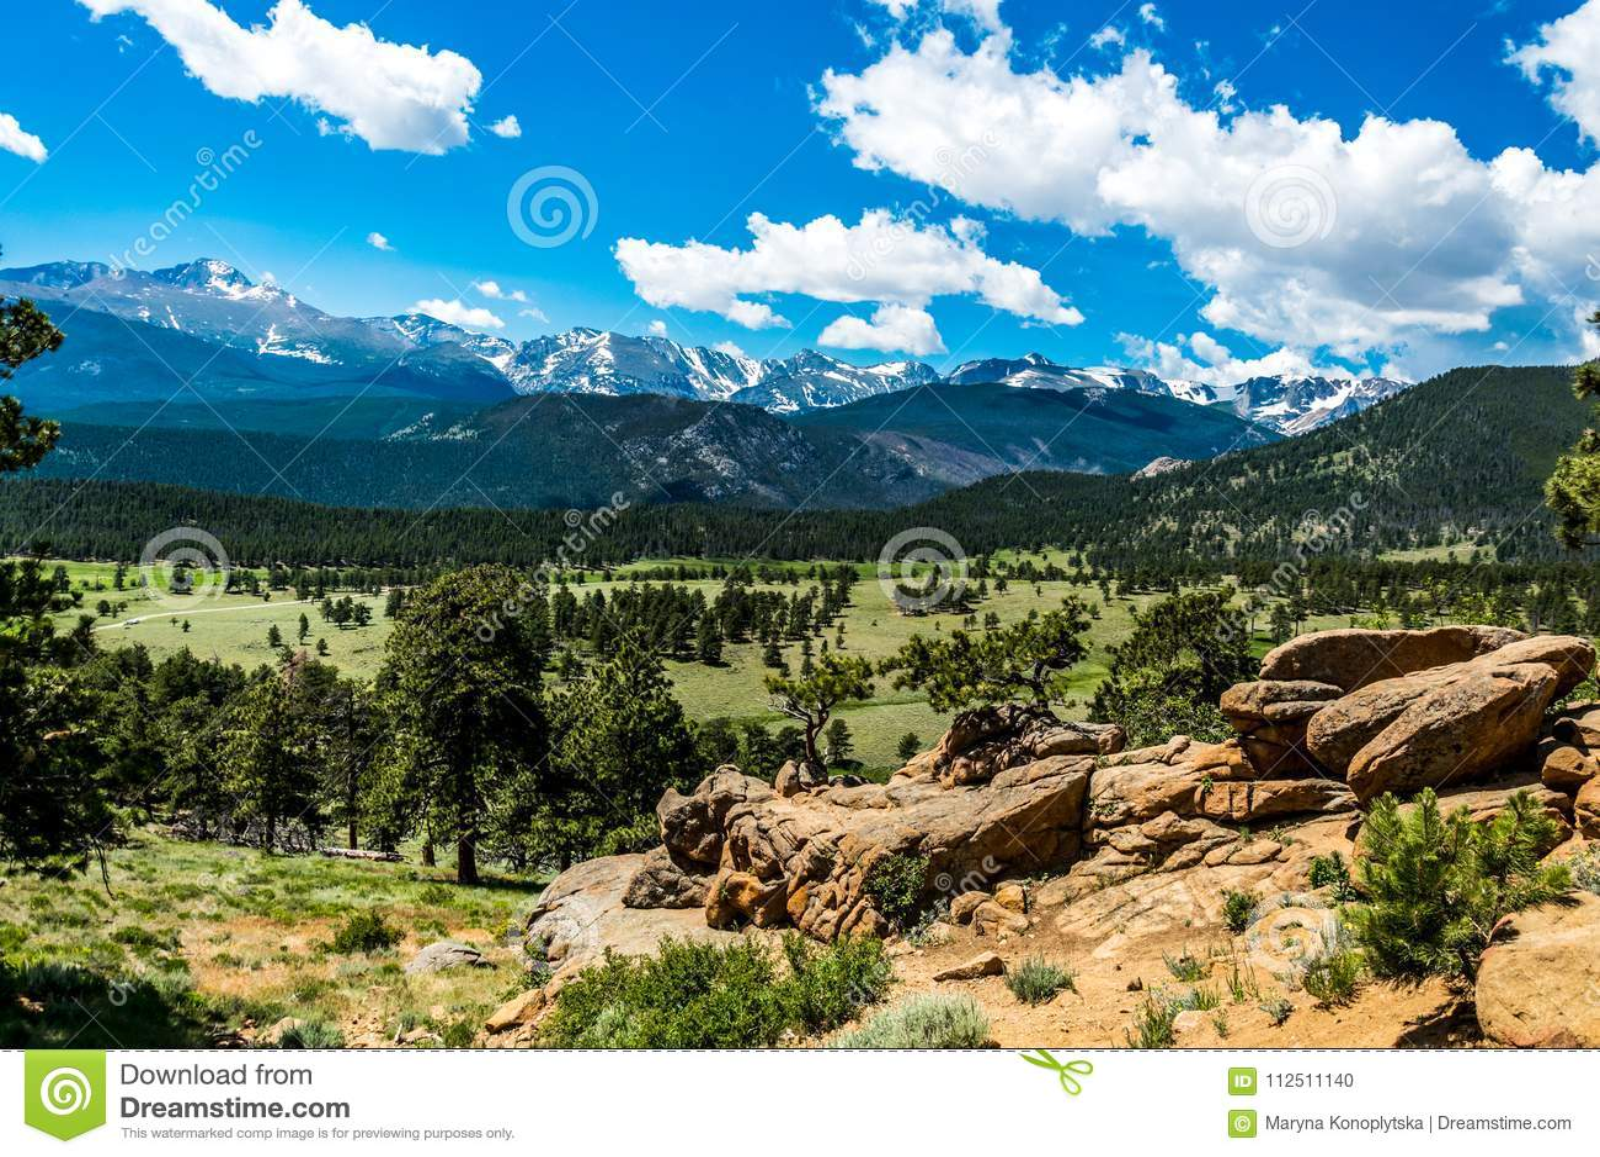 Rocky Mountain National Park Colorado Nature Of North America Usa